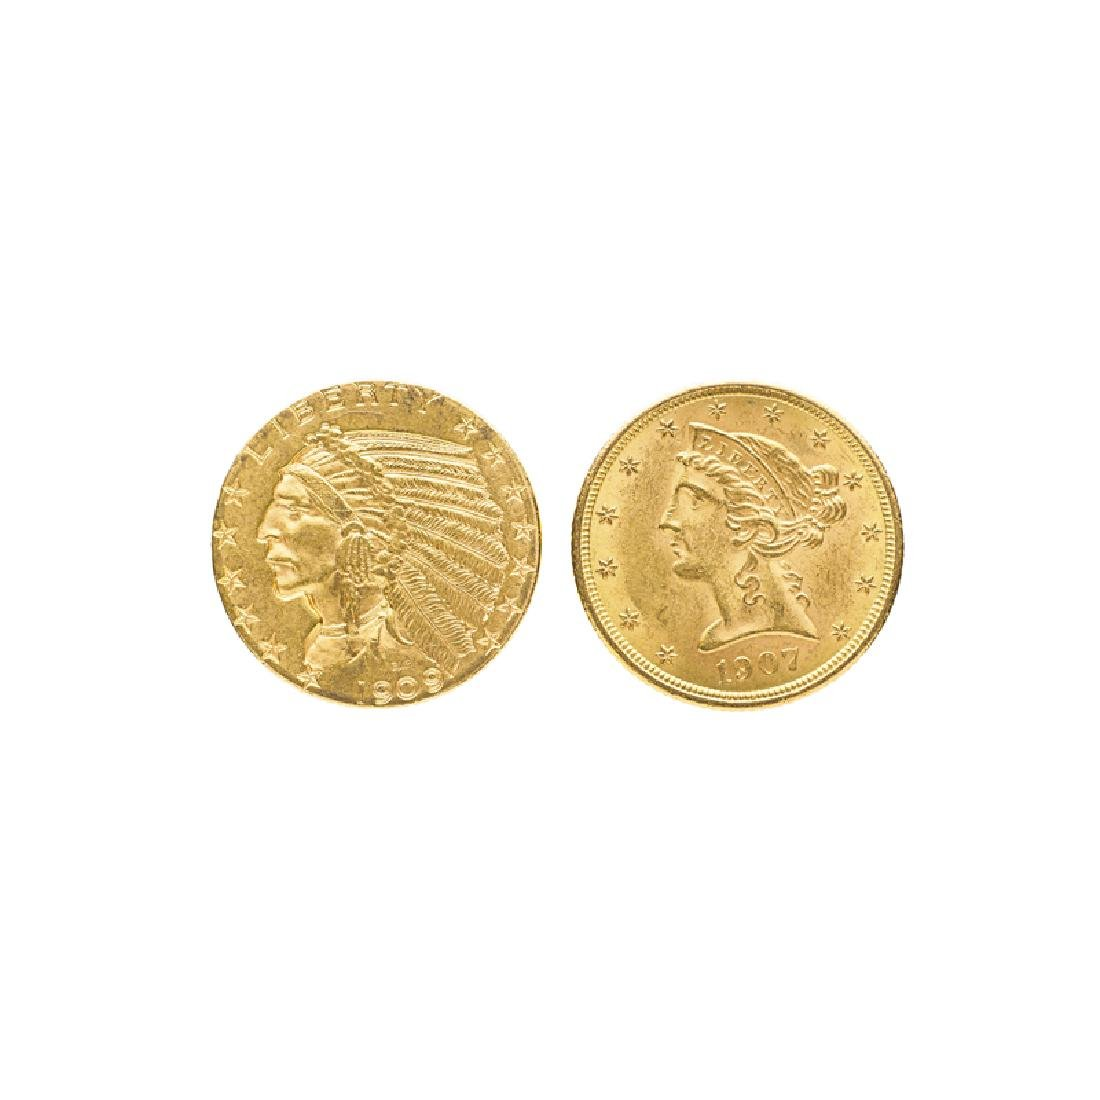 U.S. $5.00 GOLD COINS